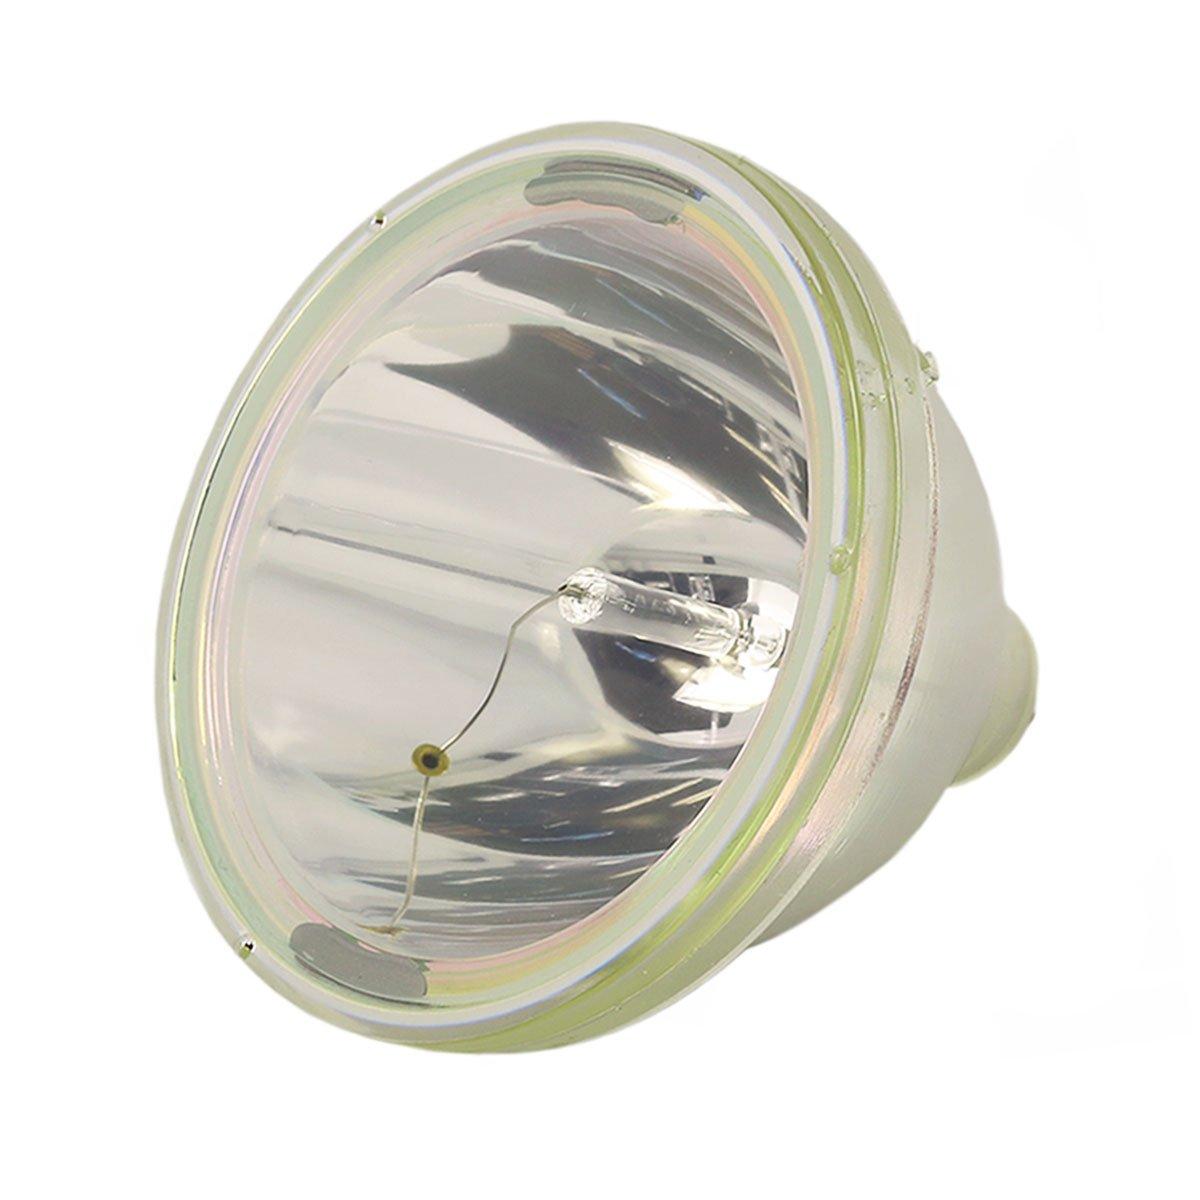 SpArc プロジェクター交換用ランプ 囲い/バルブ付き Gateway GTW-R56M103用 Economy B07MFH1BY8 Lamp Only Economy